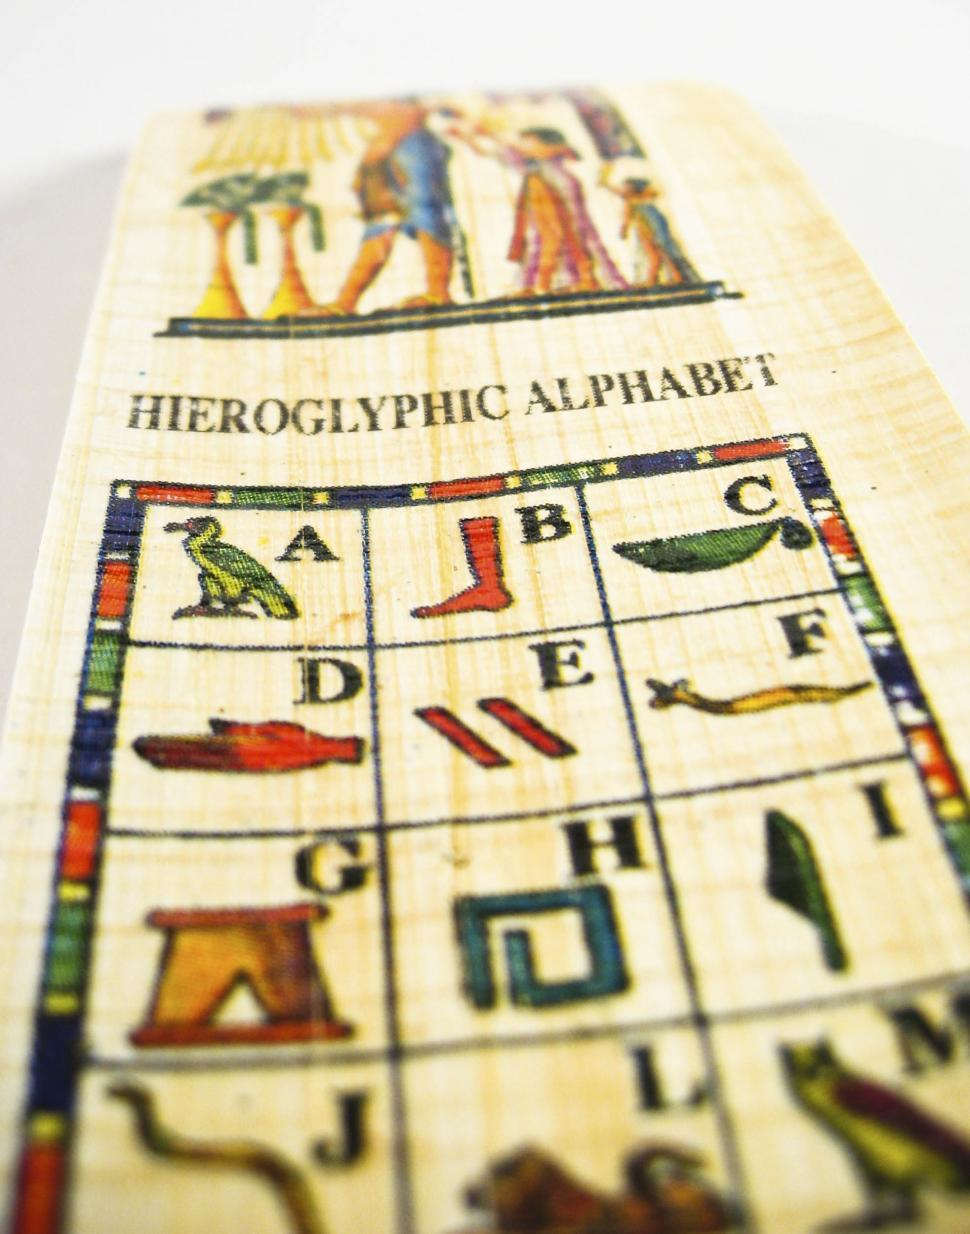 Download Free Stock HD Photo of Hieroglyphic alphabet bookmark Online